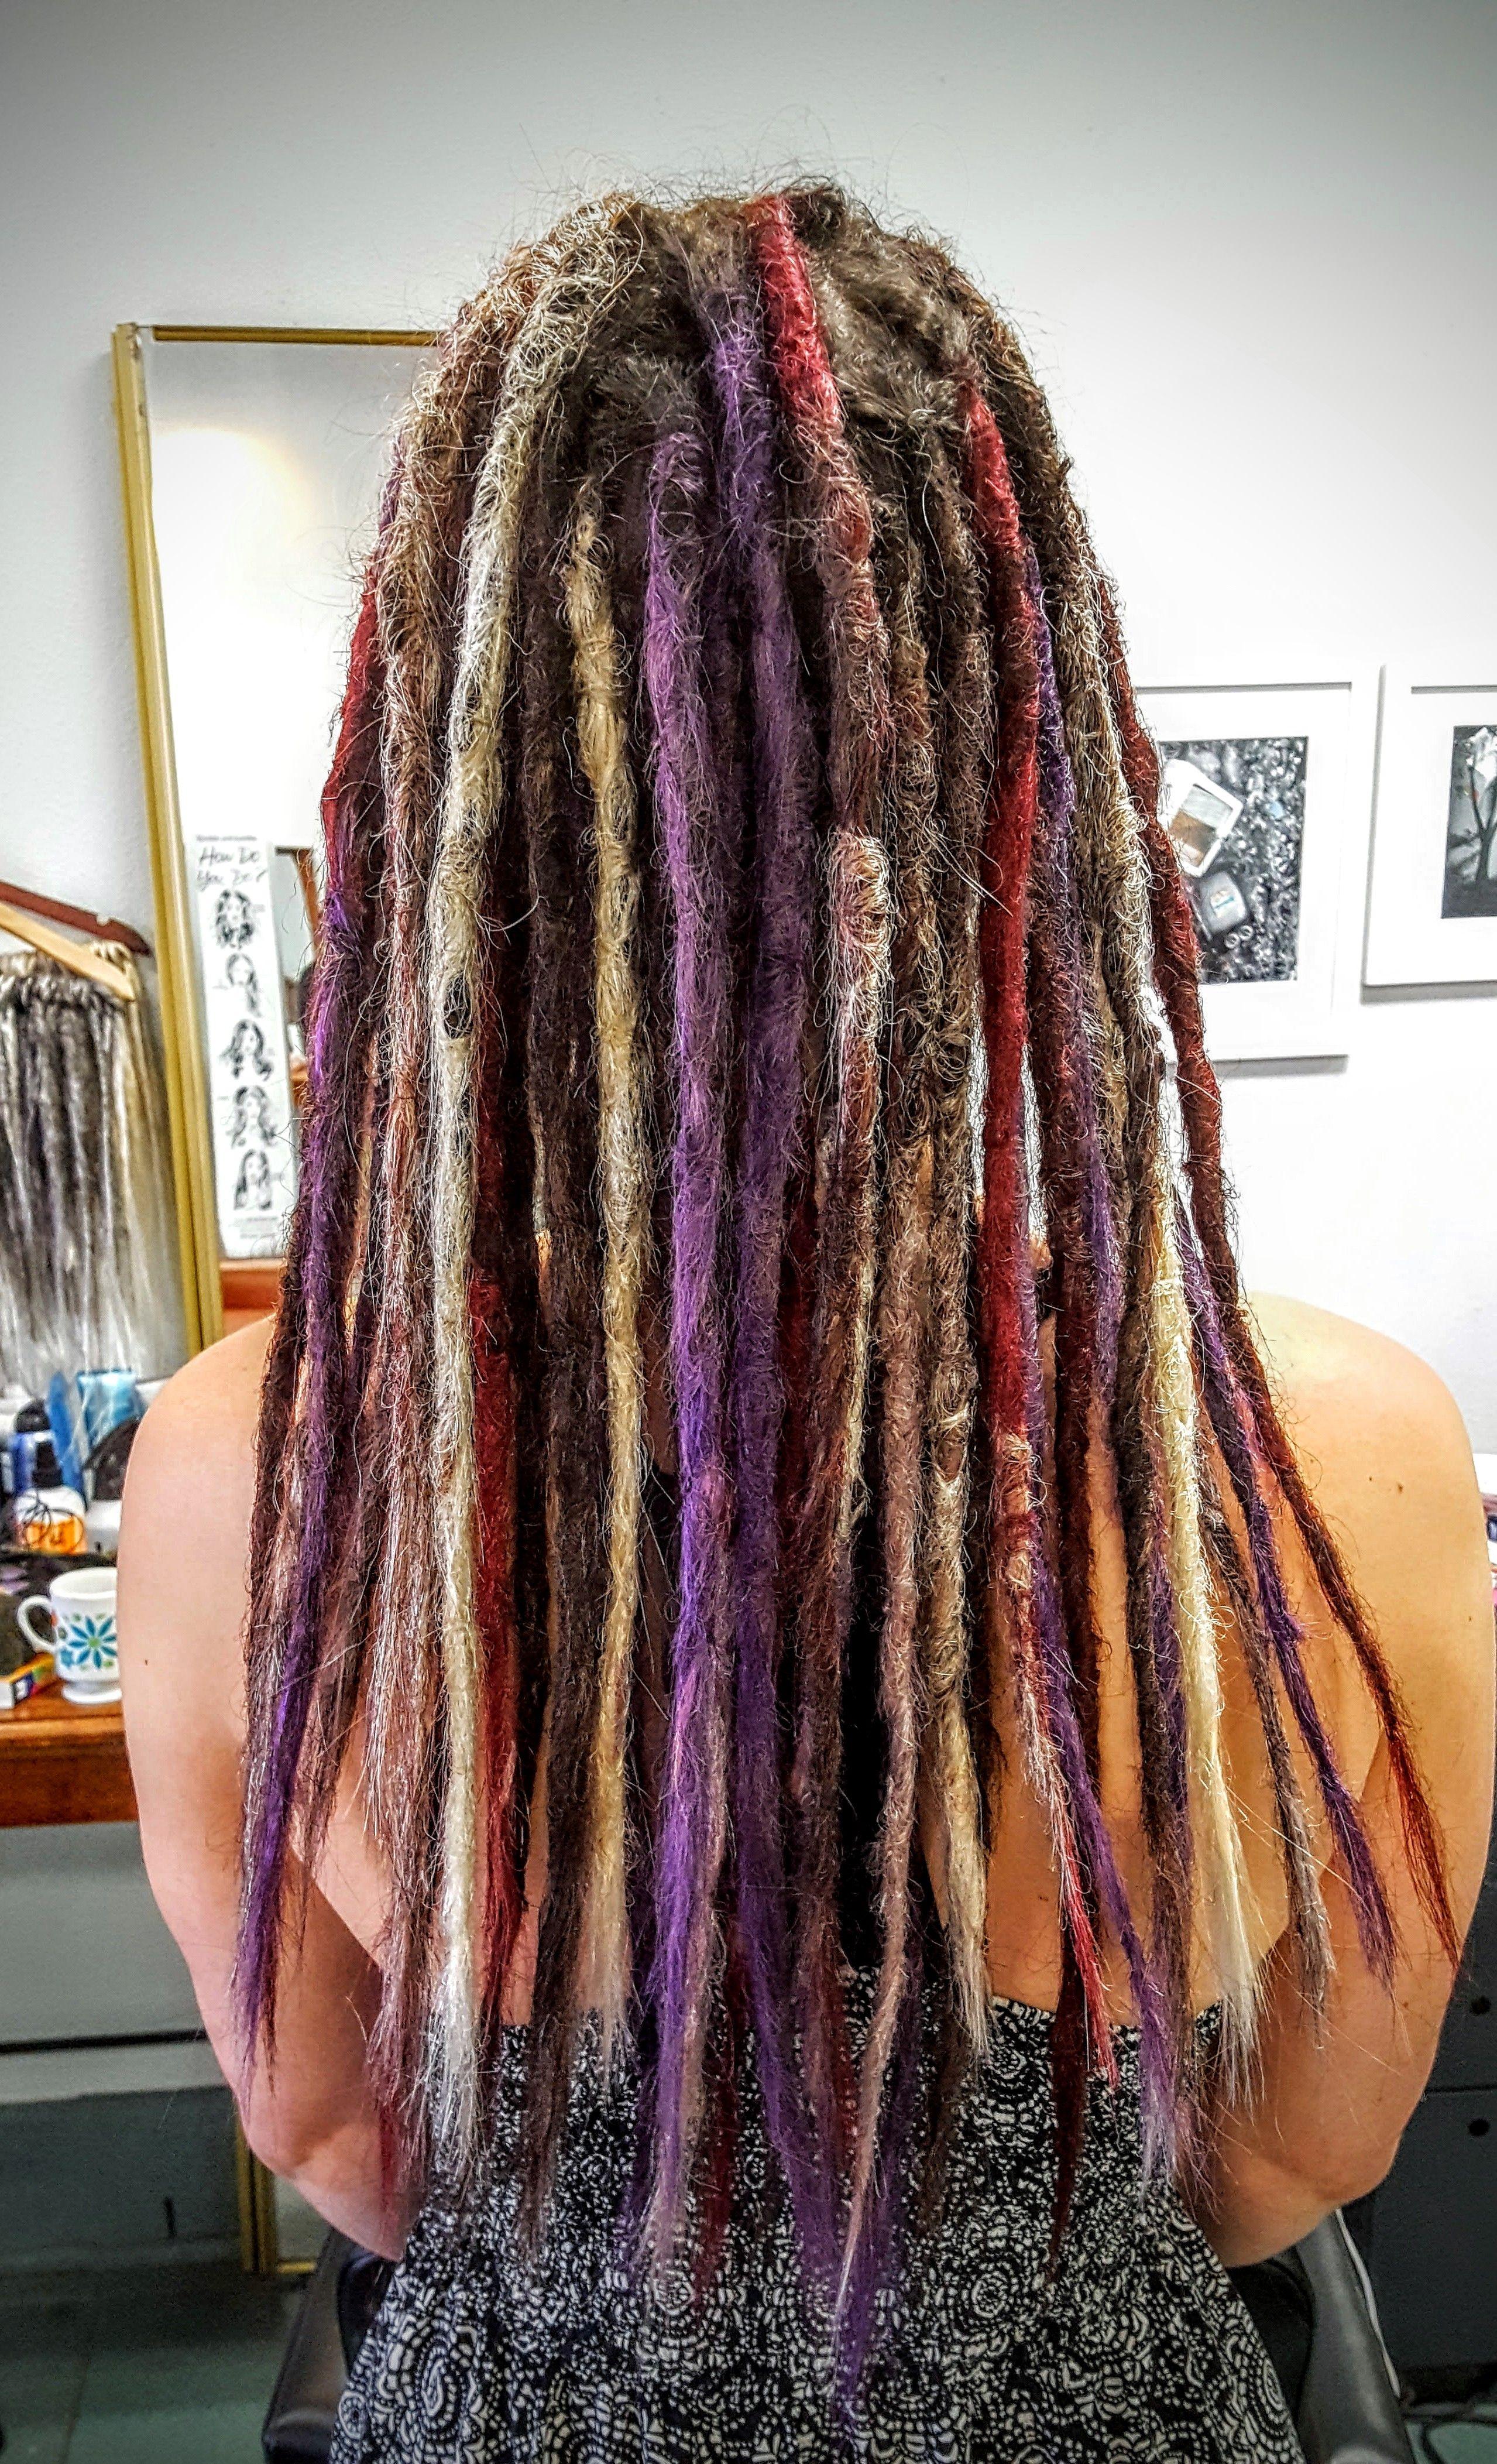 Deadlock Extensions At G Spot Hair Design Hair Designs Hair Lengths Dreadlocks